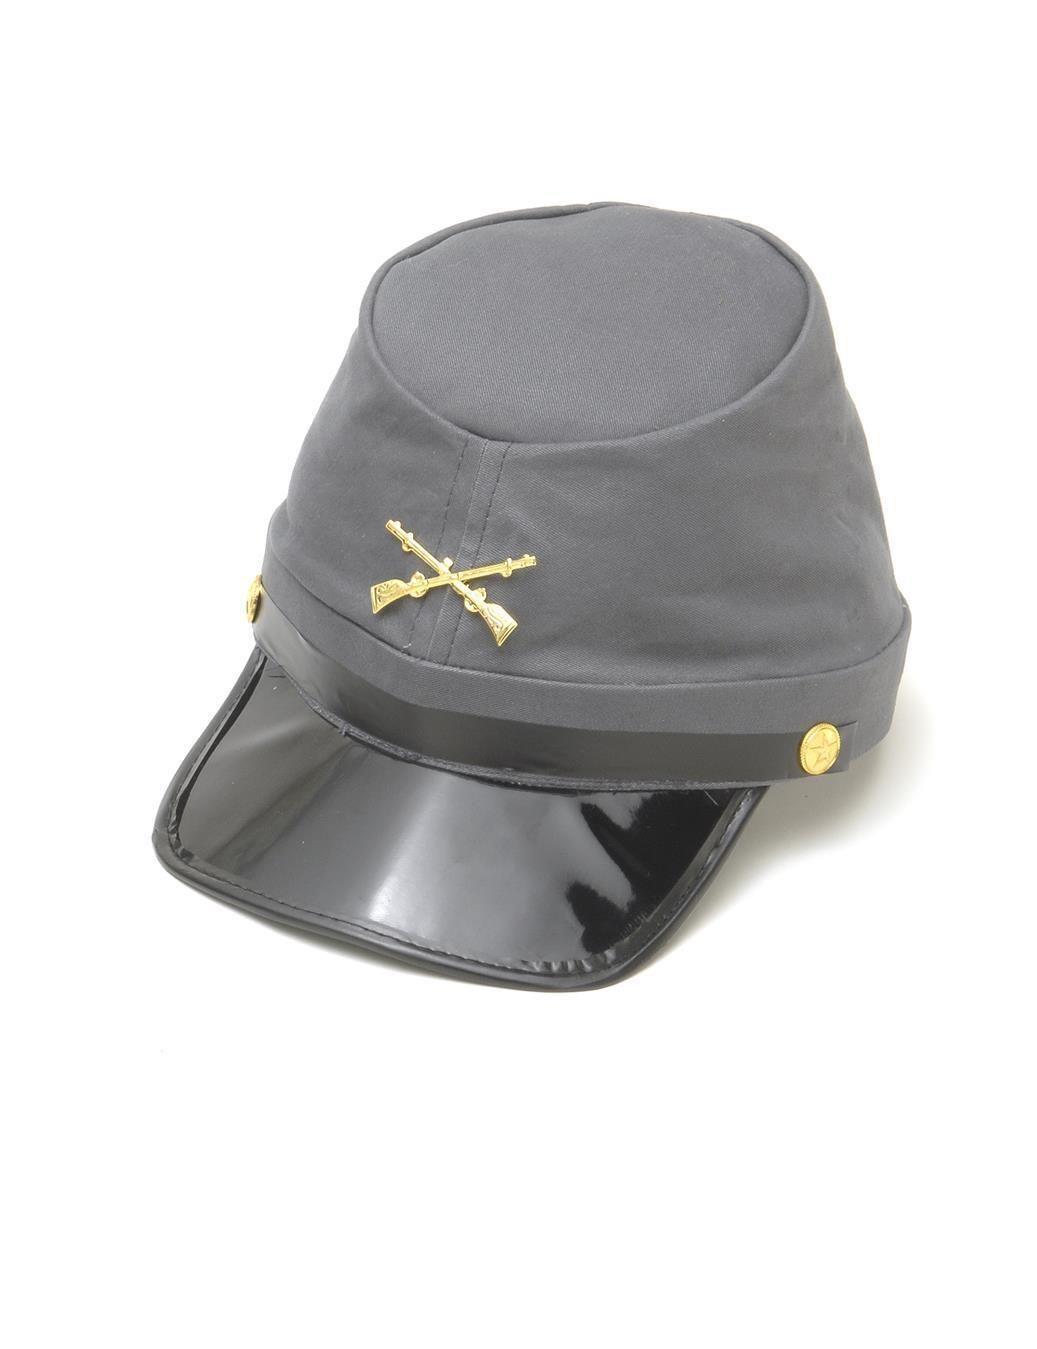 3702c5221e8 Confederate Army Soldier Kepi Hat Civil War Cap Adult Costume Accessory